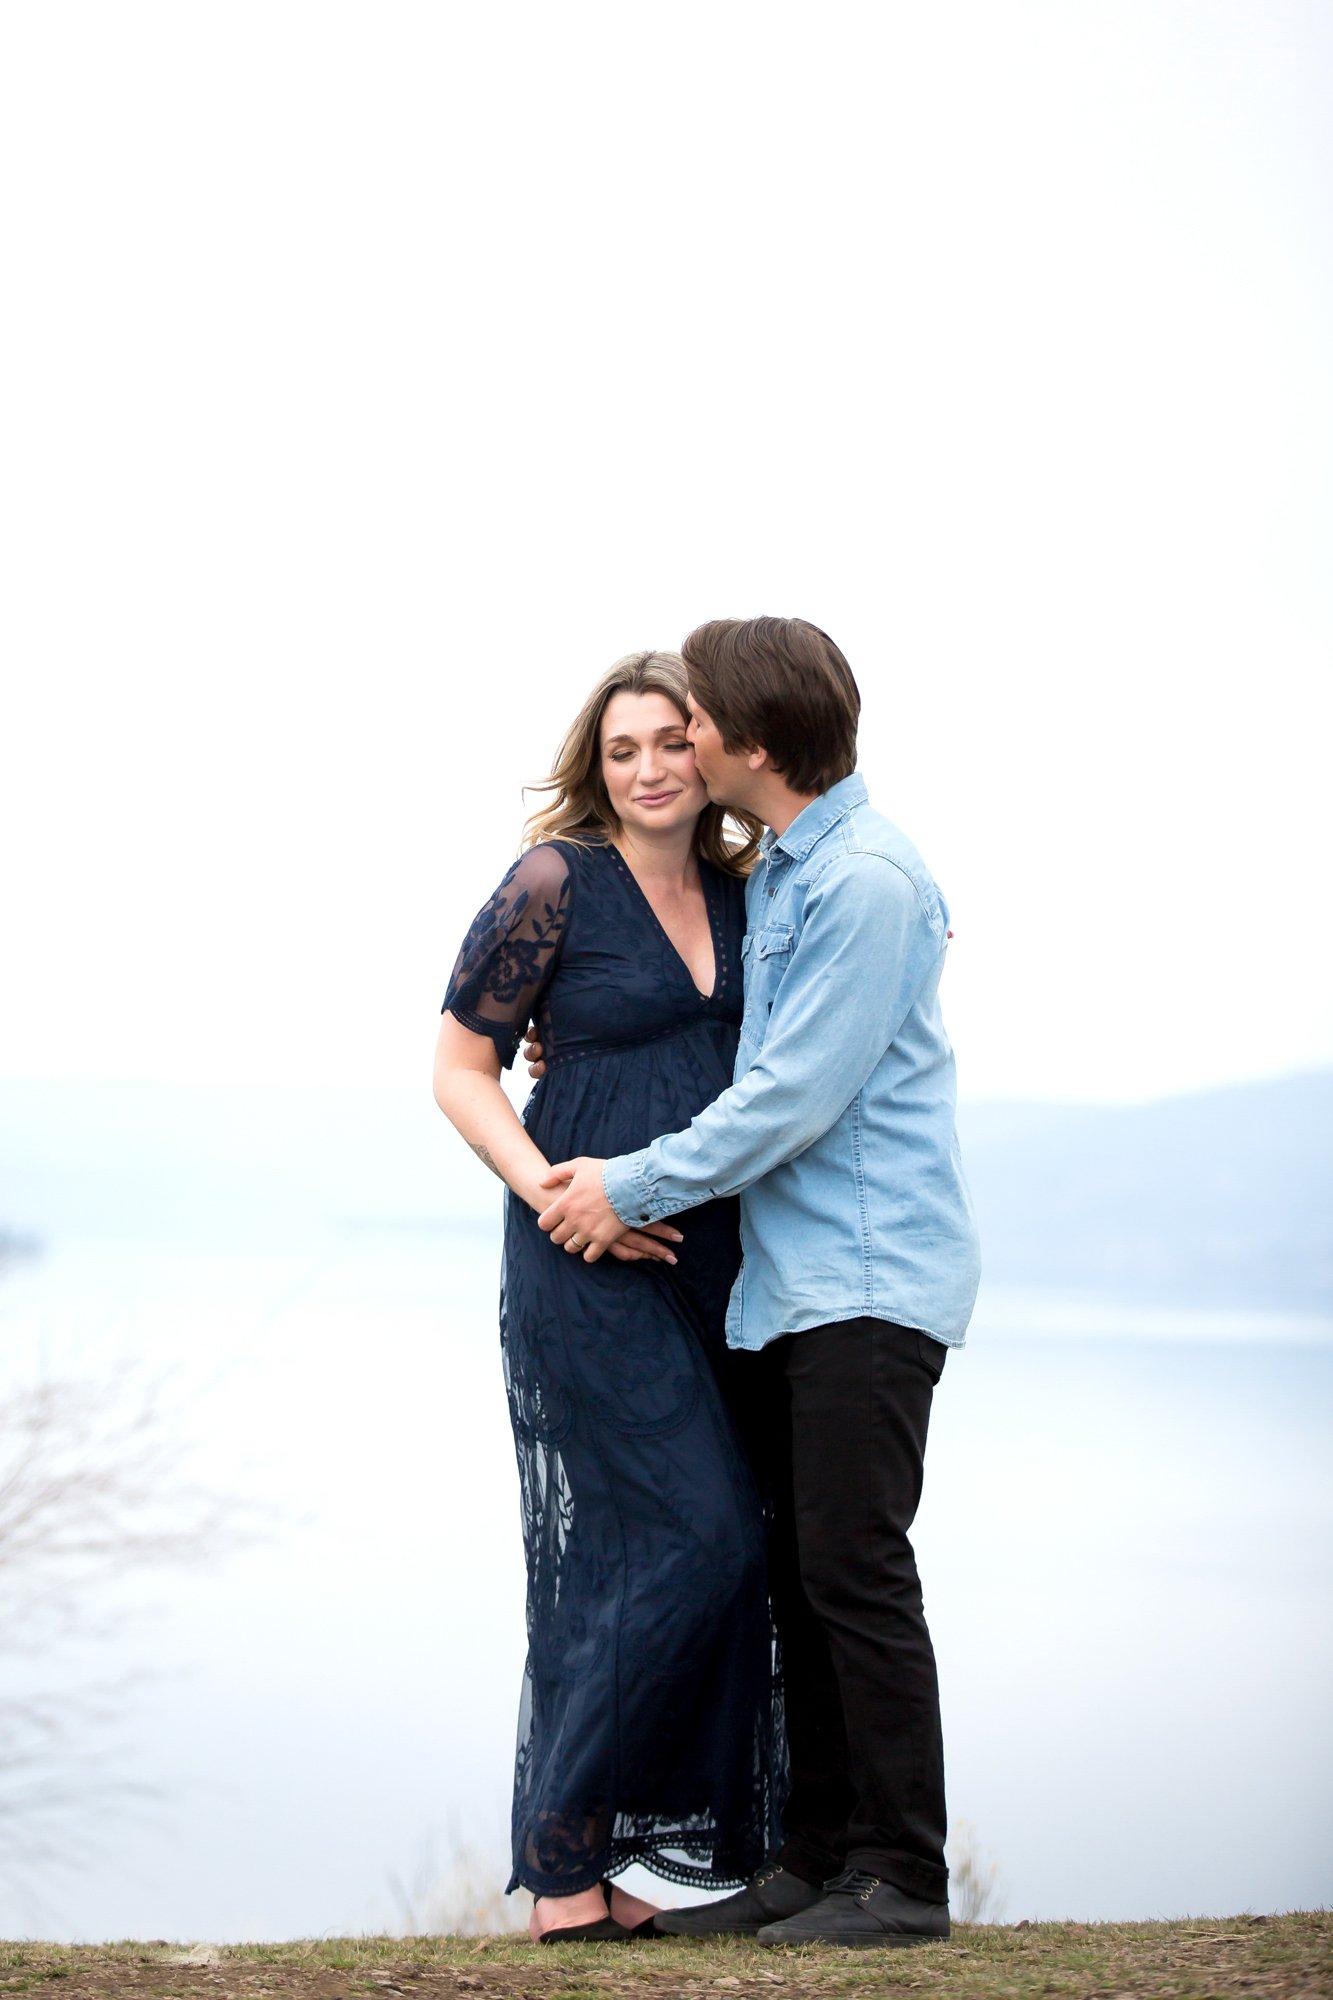 A couple kissing on a mounatin top